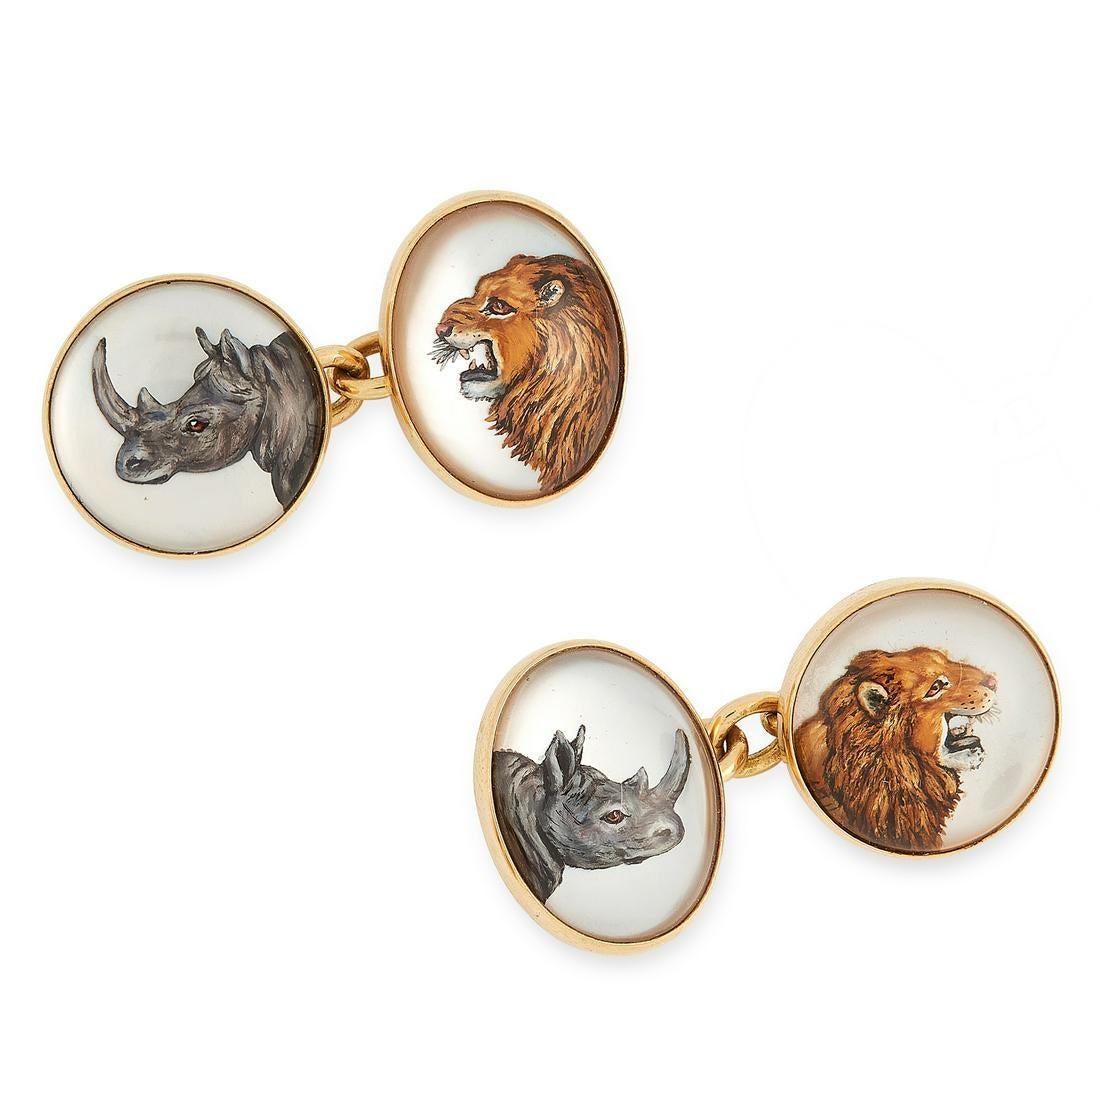 A PAIR OF REVERSE INTAGLIO AFRICAN SAFARI ANIMAL CUFFLINKS, DEAKIN & FRANCIS in 18ct yellow gold,